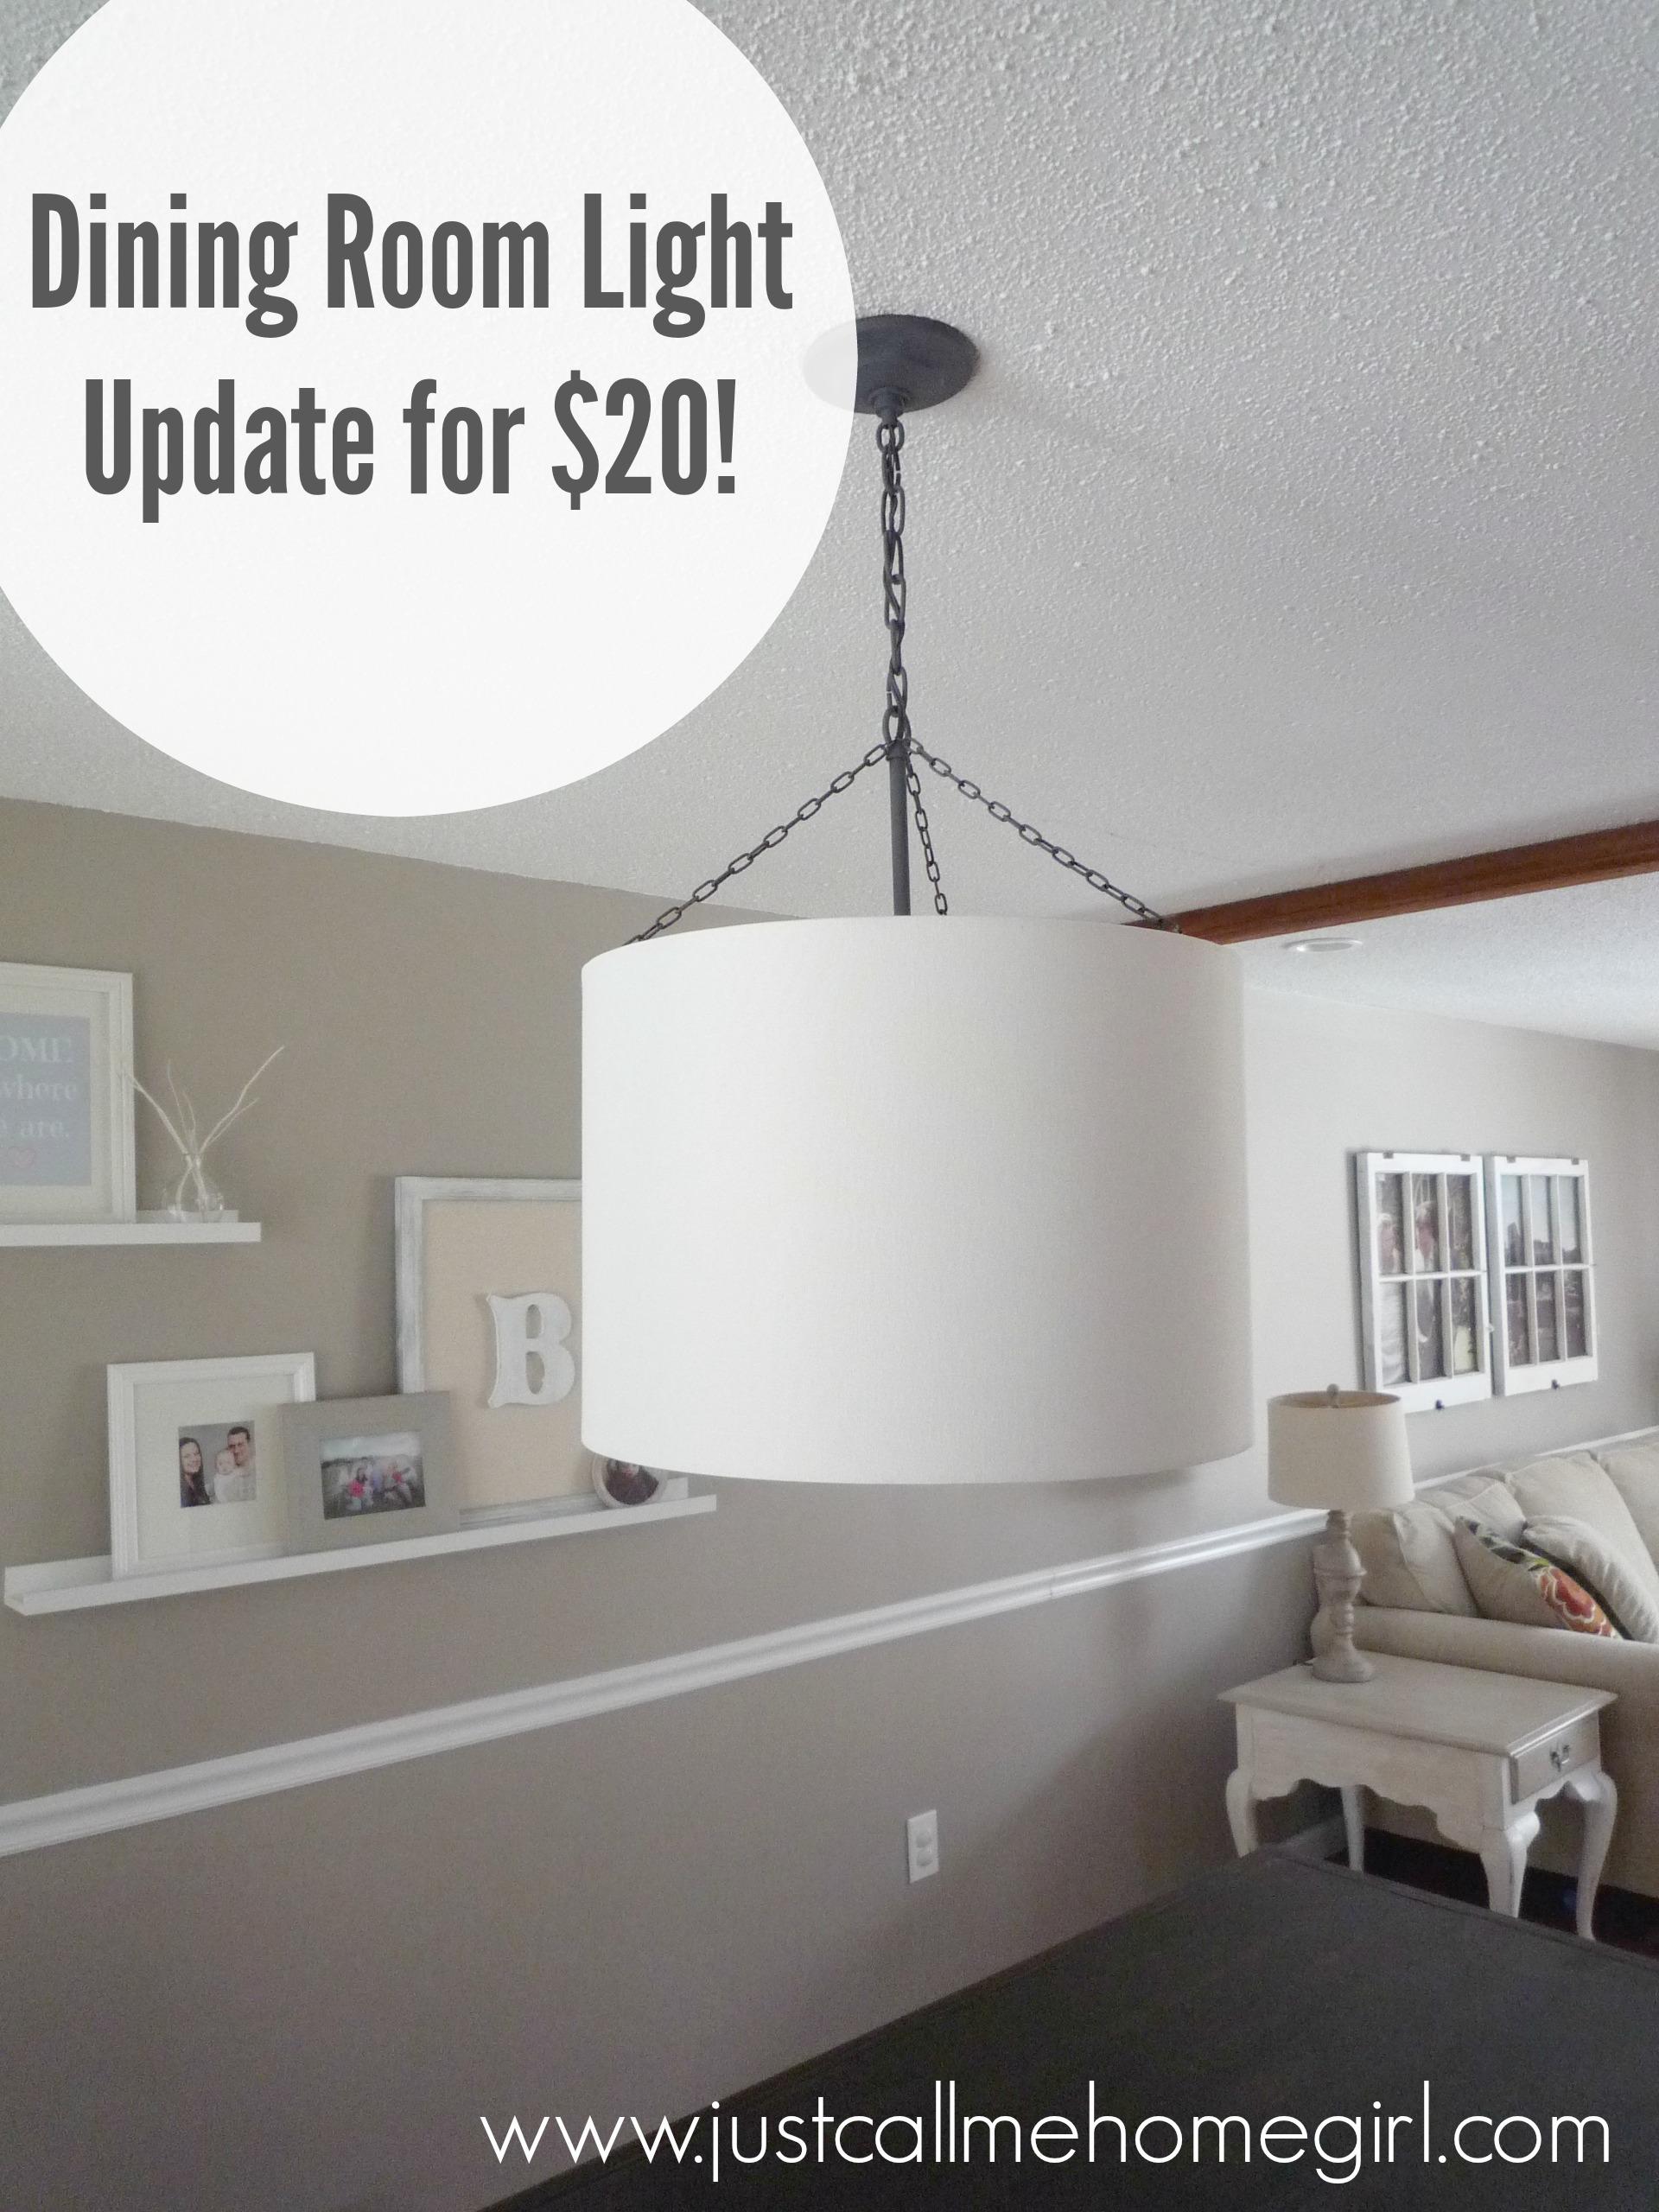 Dining Room Light Fixture Update